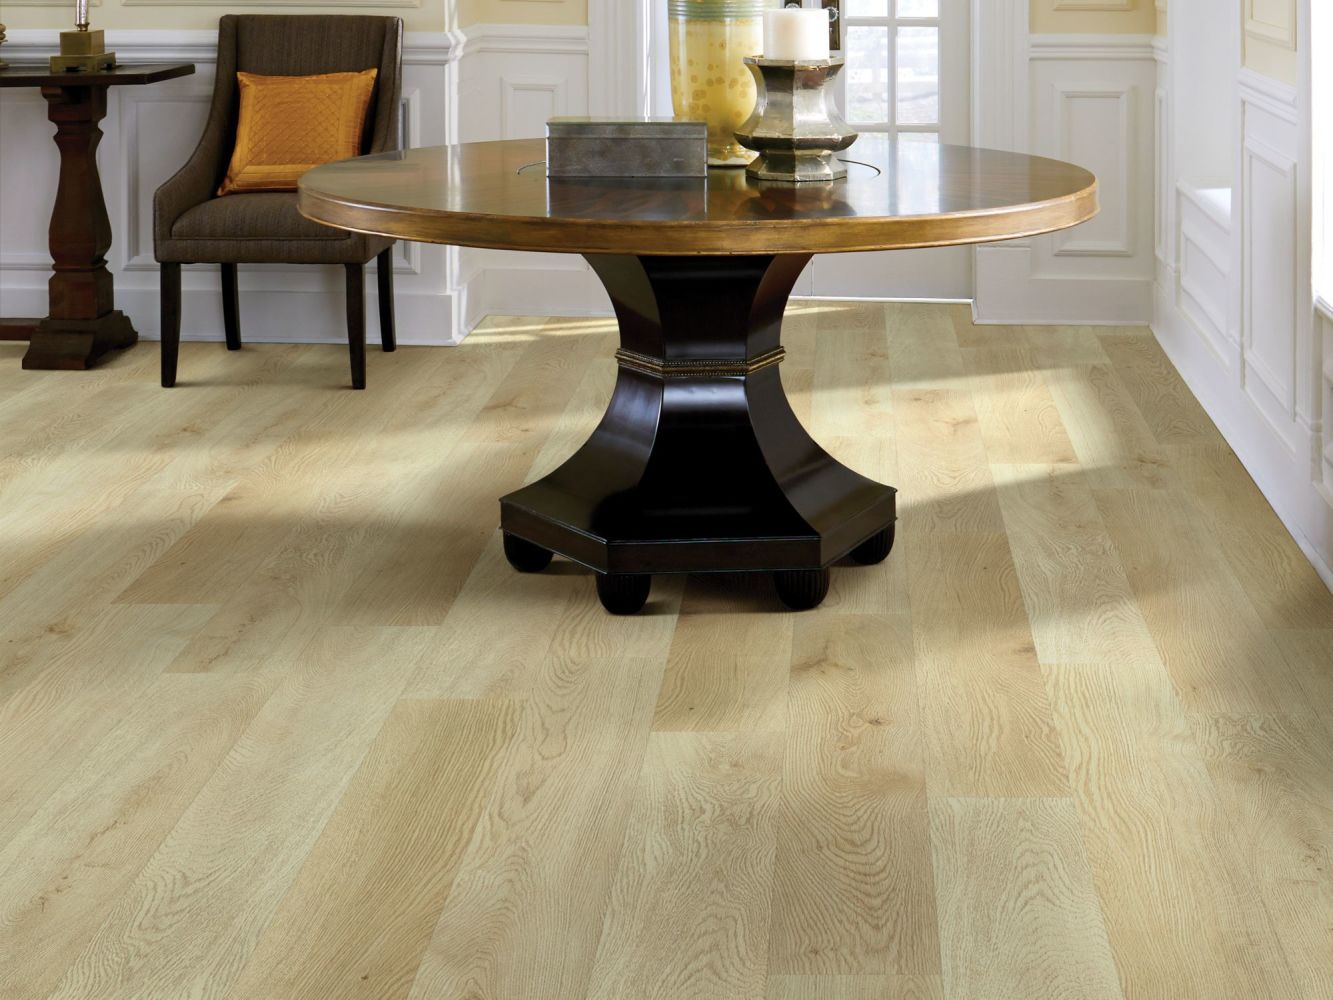 Shaw Floors Travera Plus 20 River Bend Oak 00296_FR622